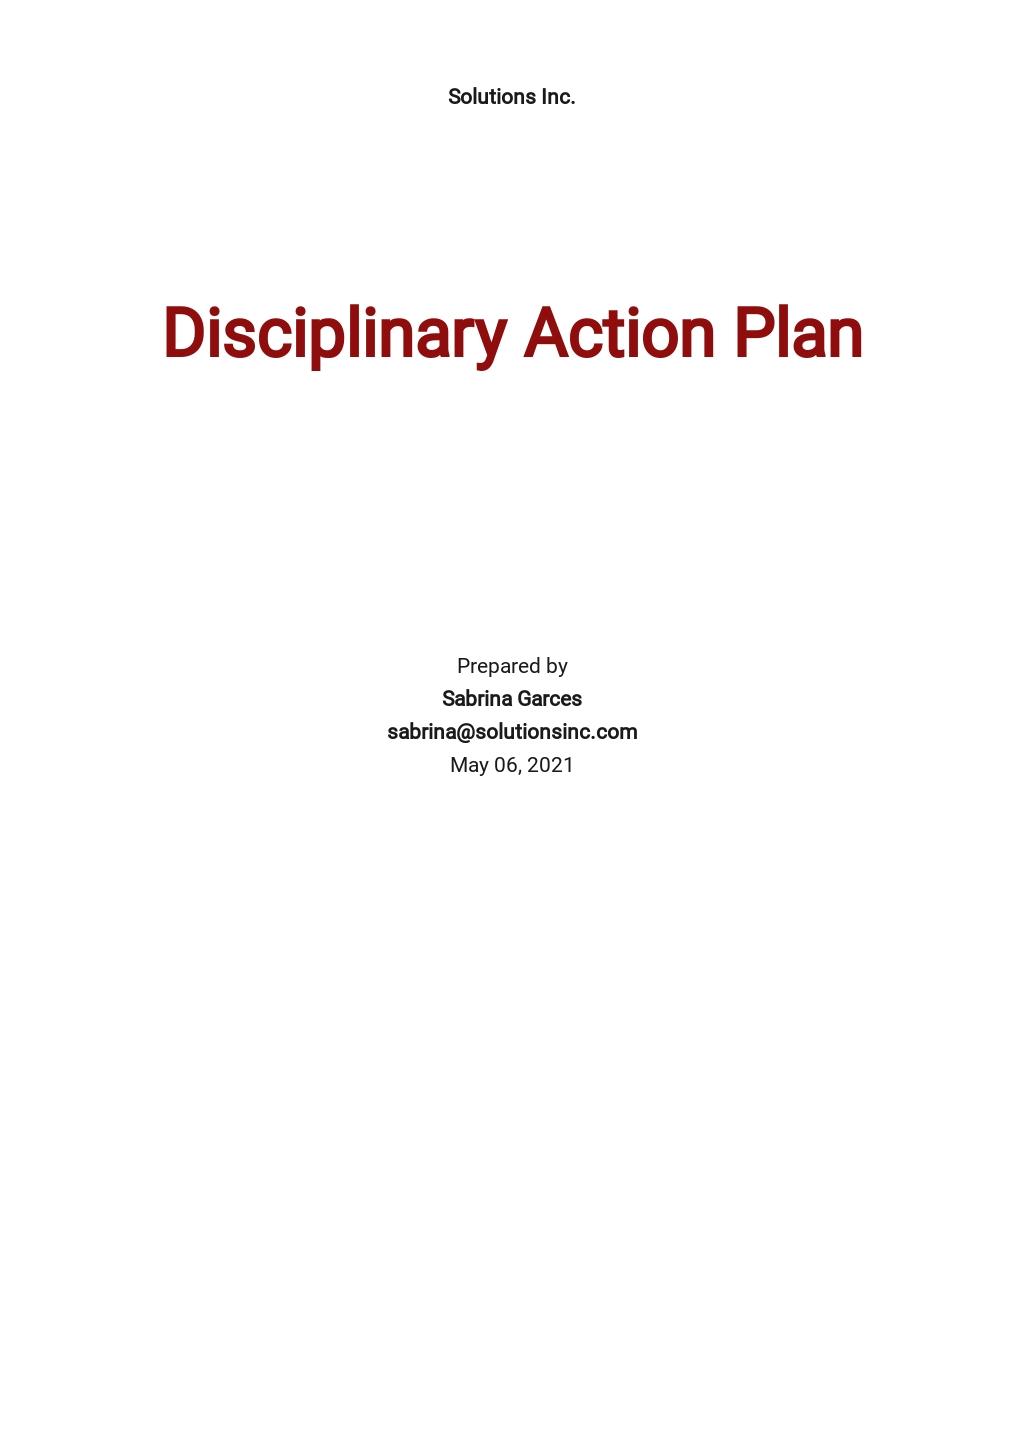 Disciplinary Action Plan Template.jpe